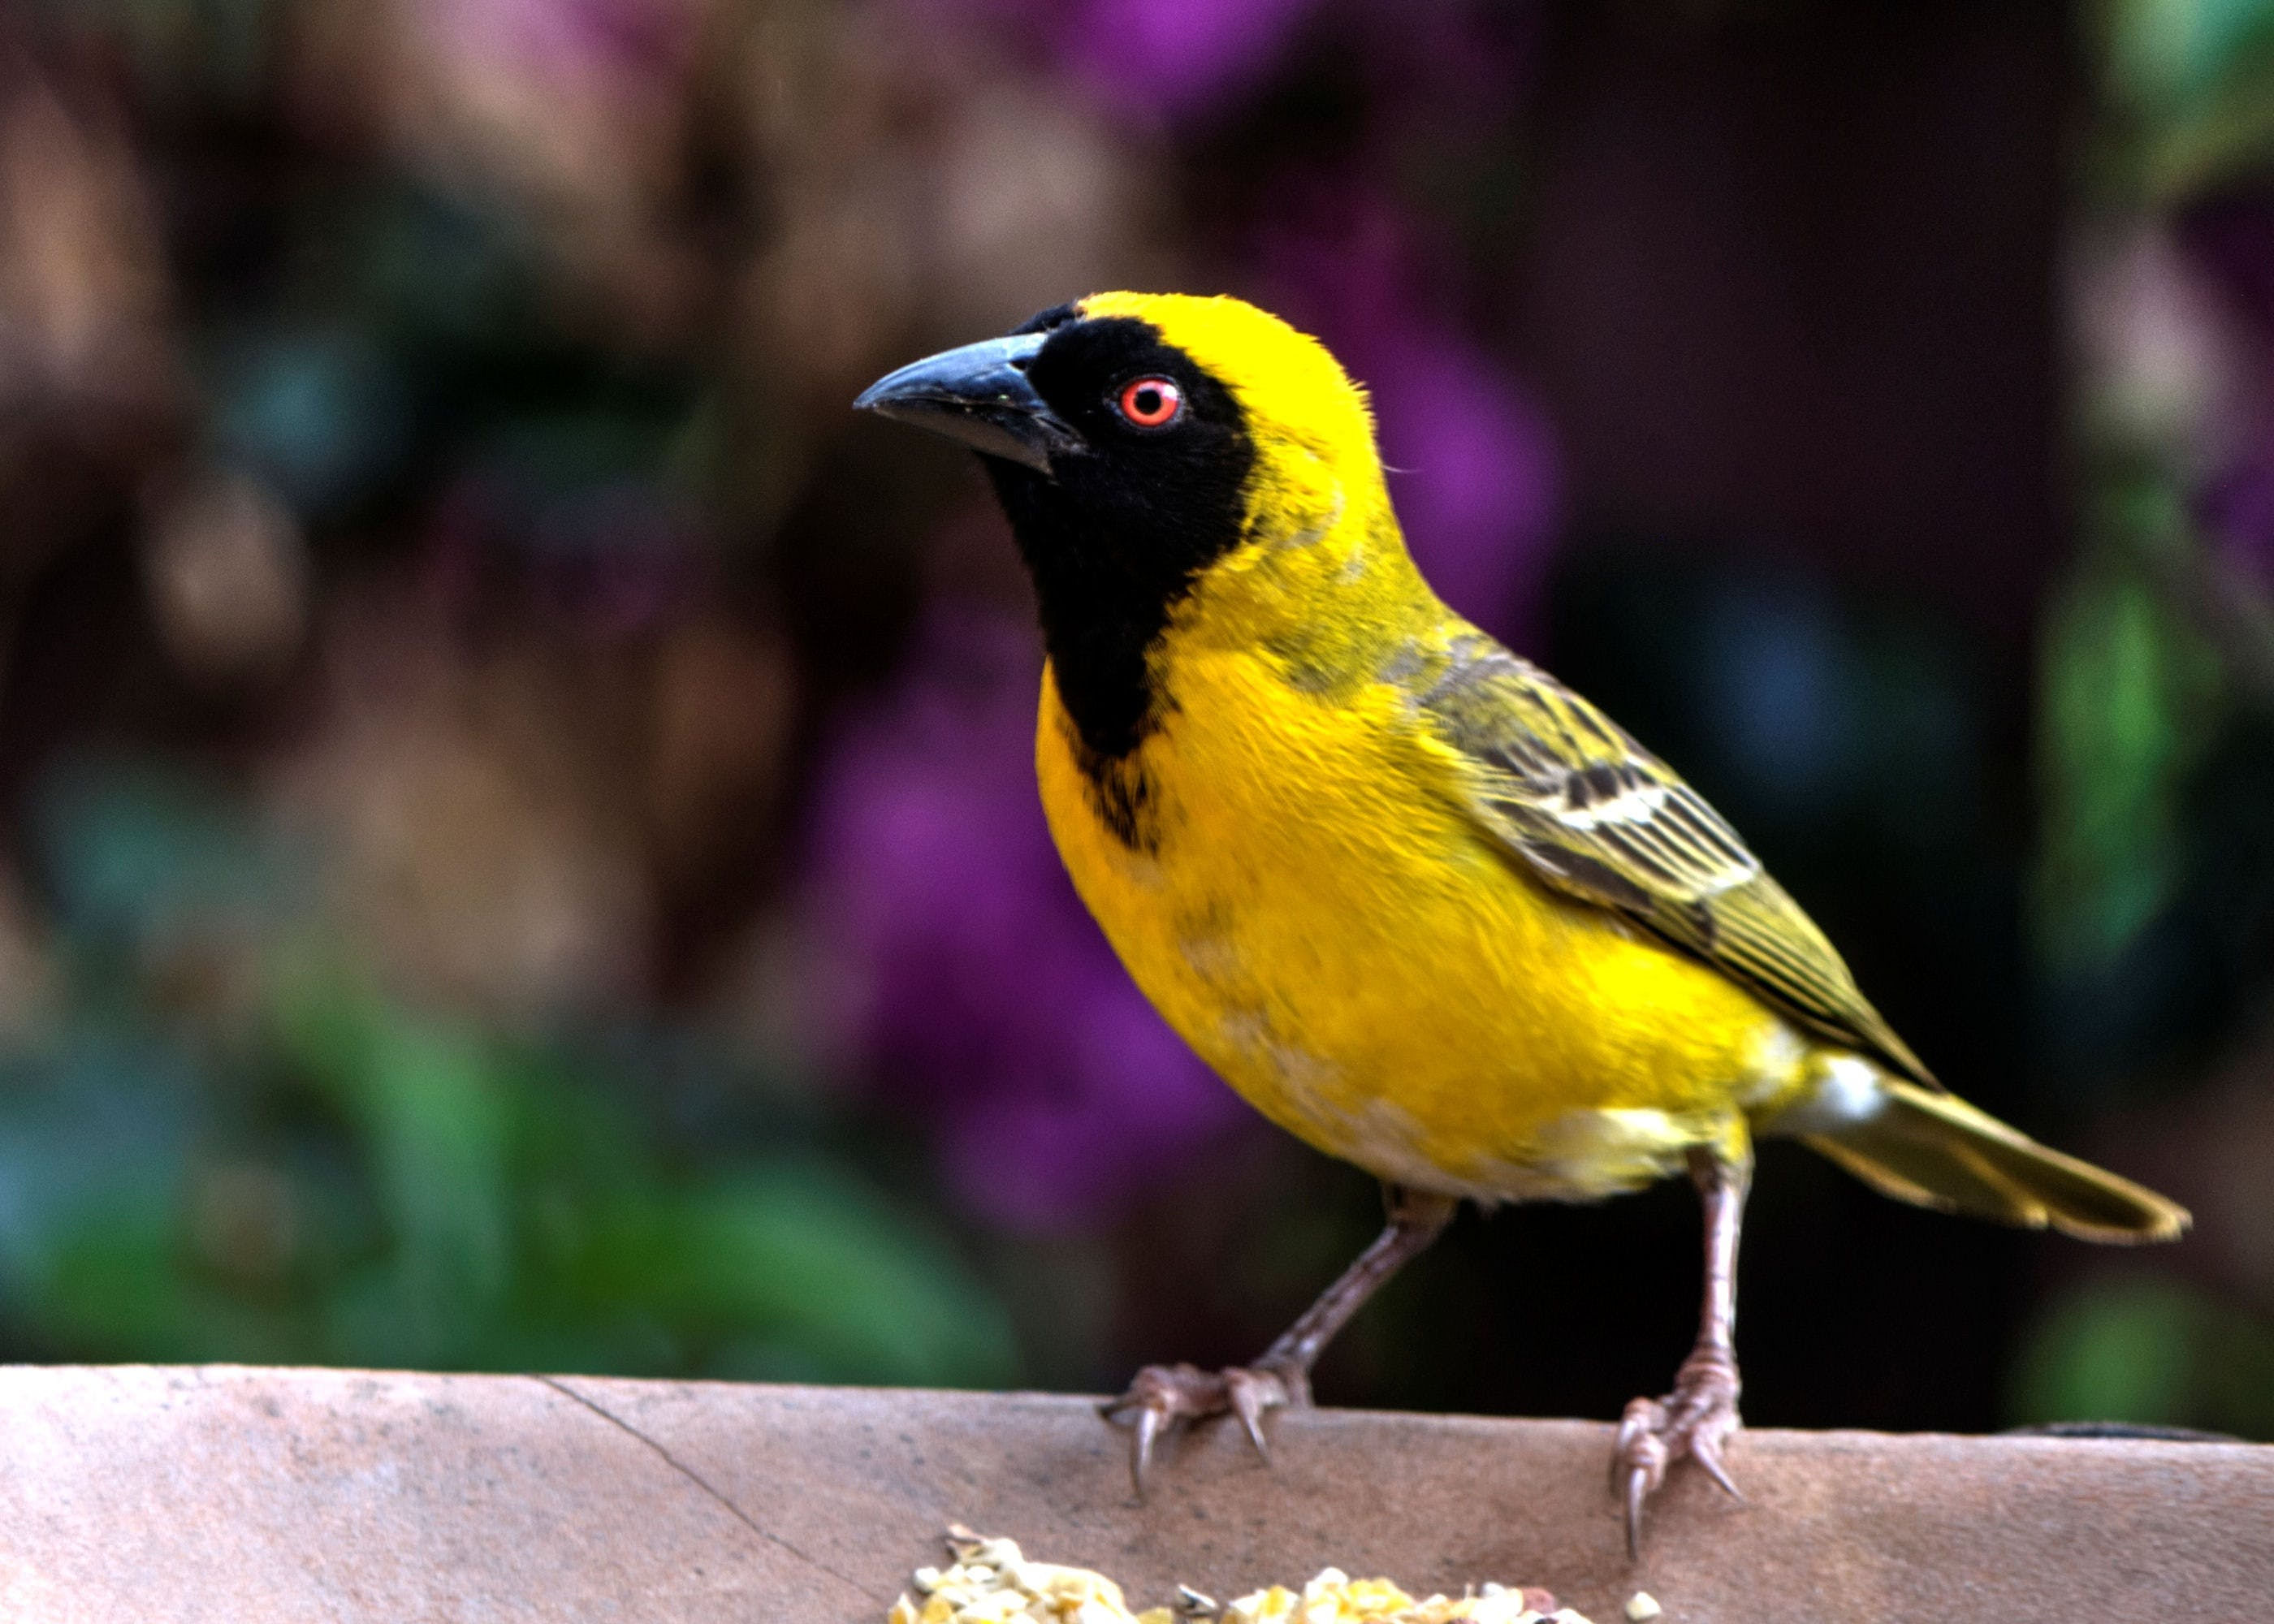 Bird Perching on Outdoors